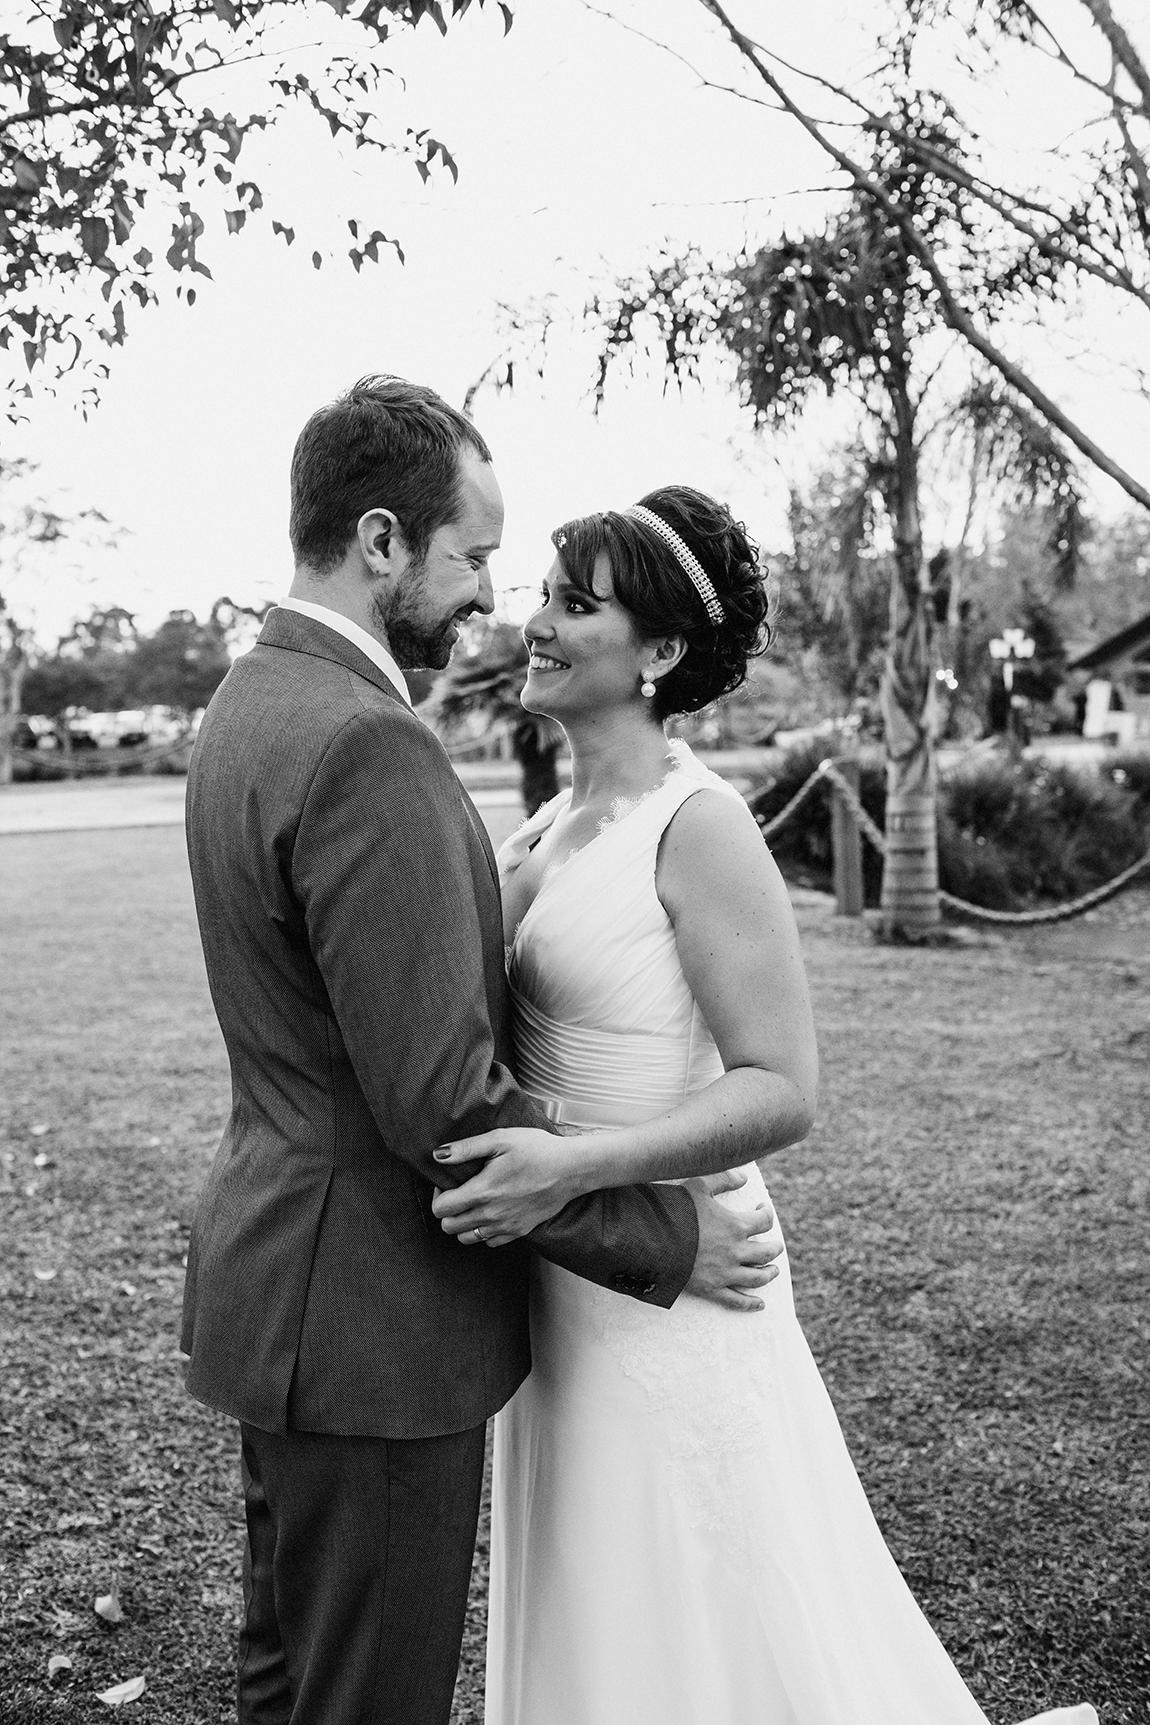 mariana-alves-fotografia-casamento-curitiba-willian-tais (240)